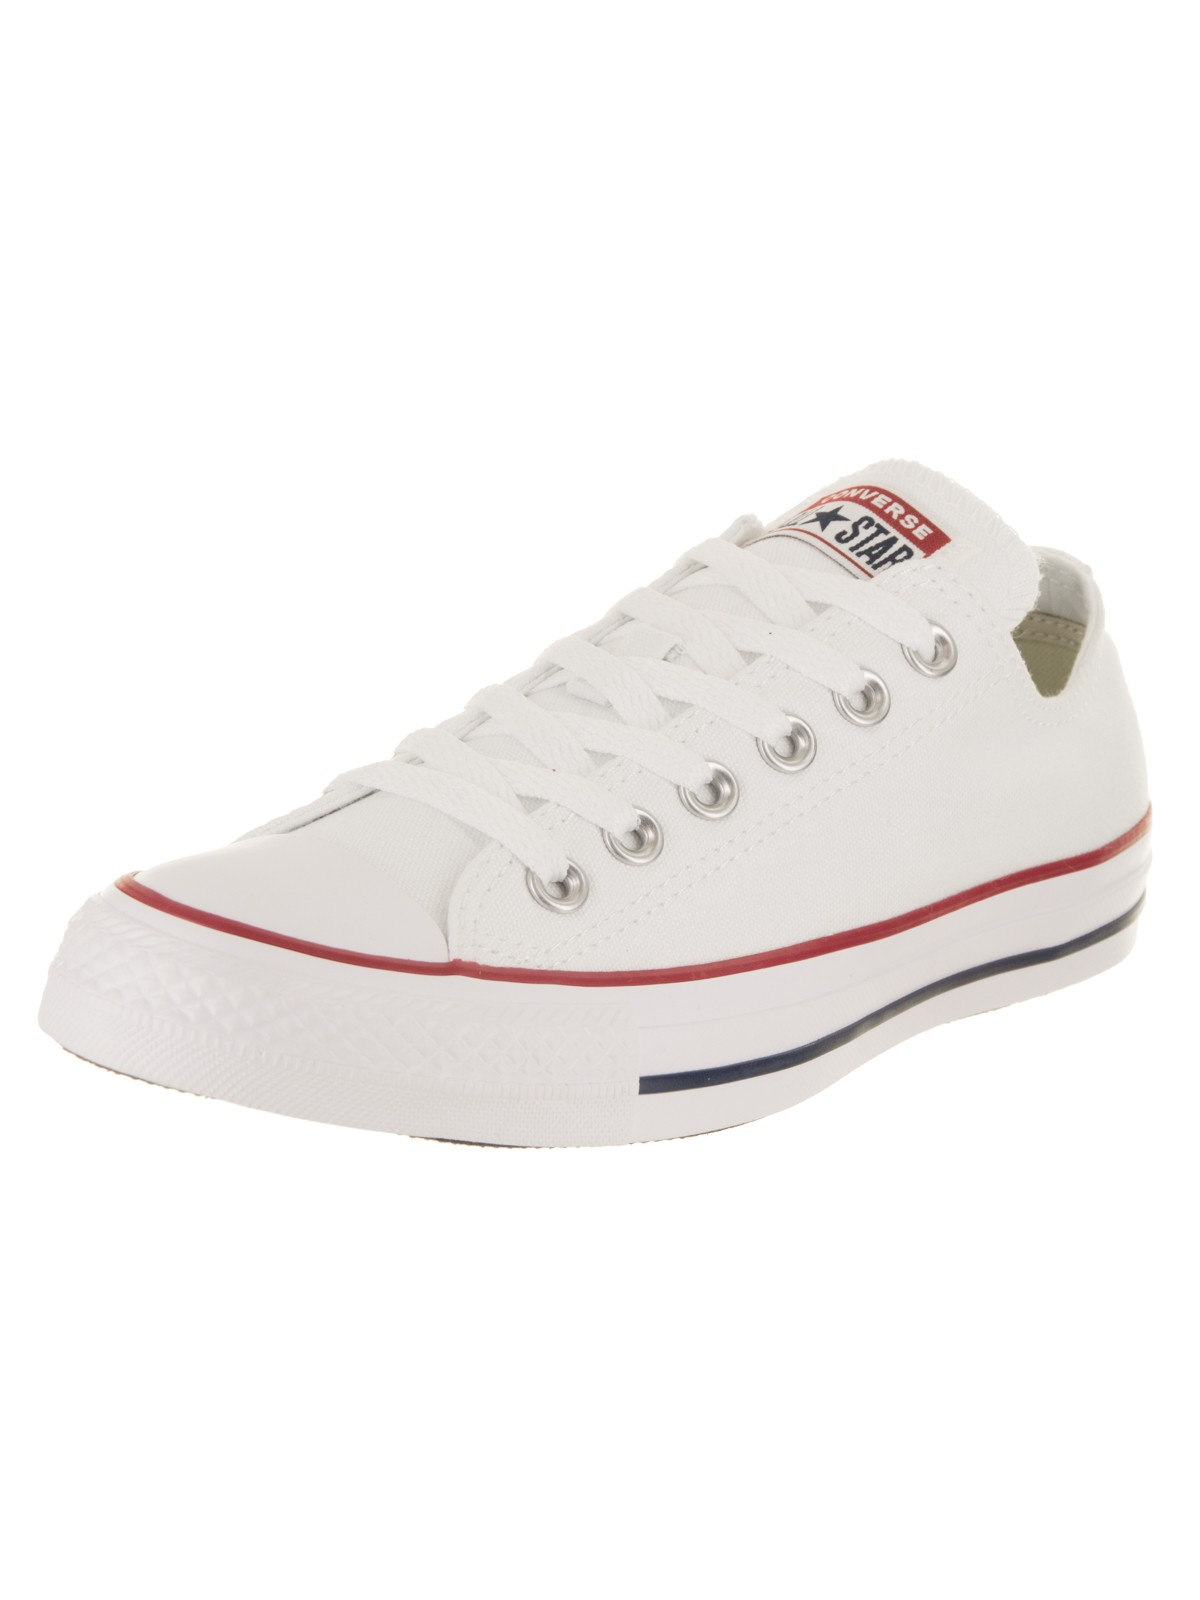 Star Ox Basketball Shoe